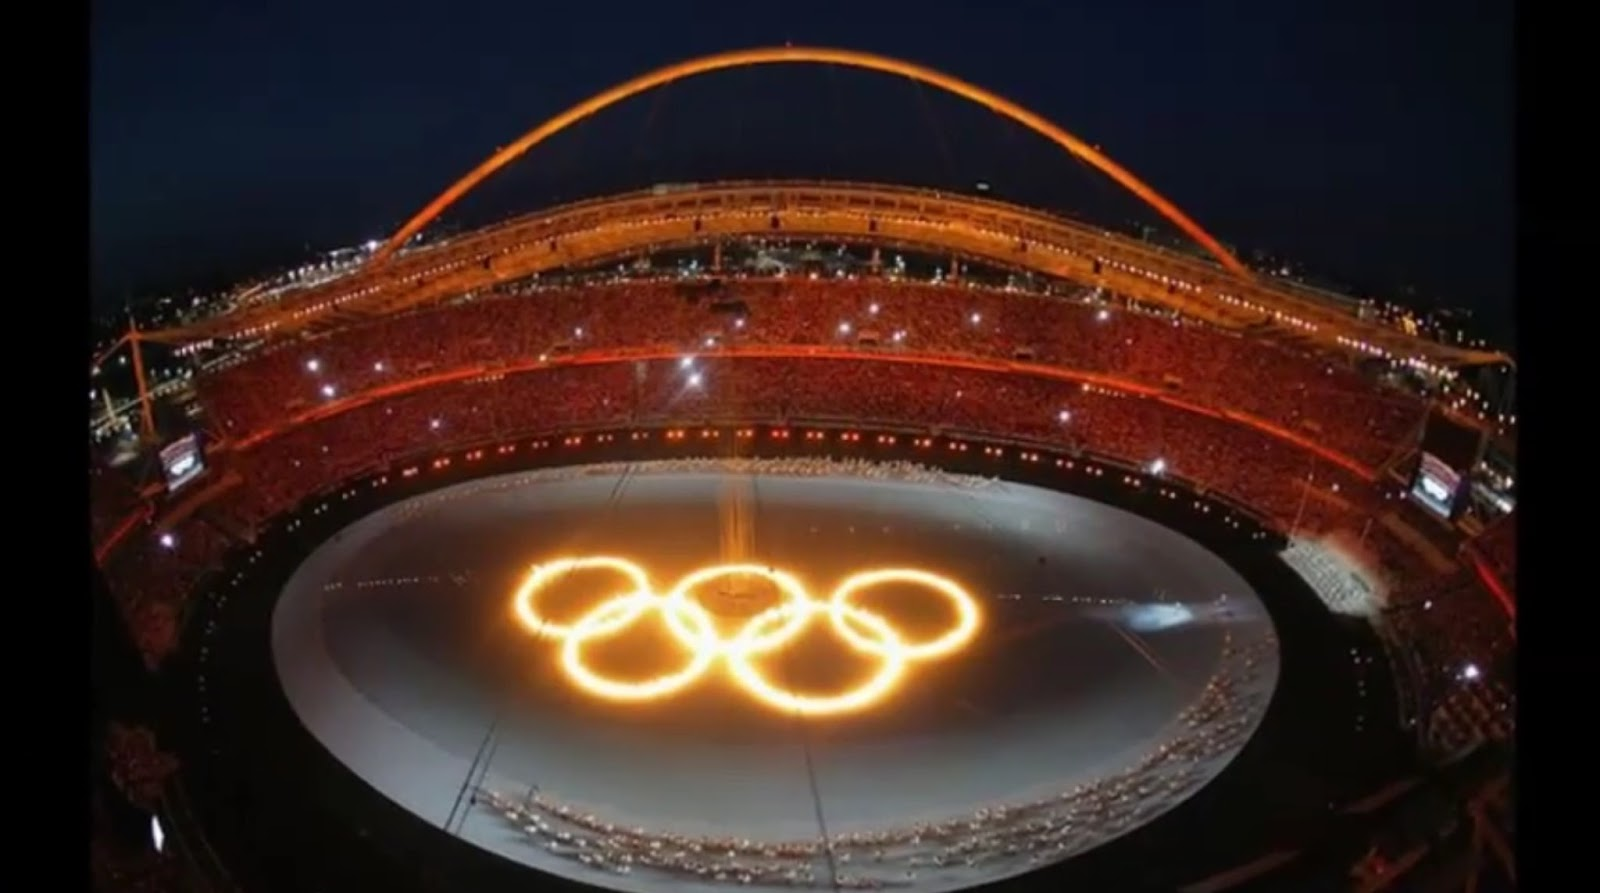 RIO OLYMPICS OPENING CEREMONY 8